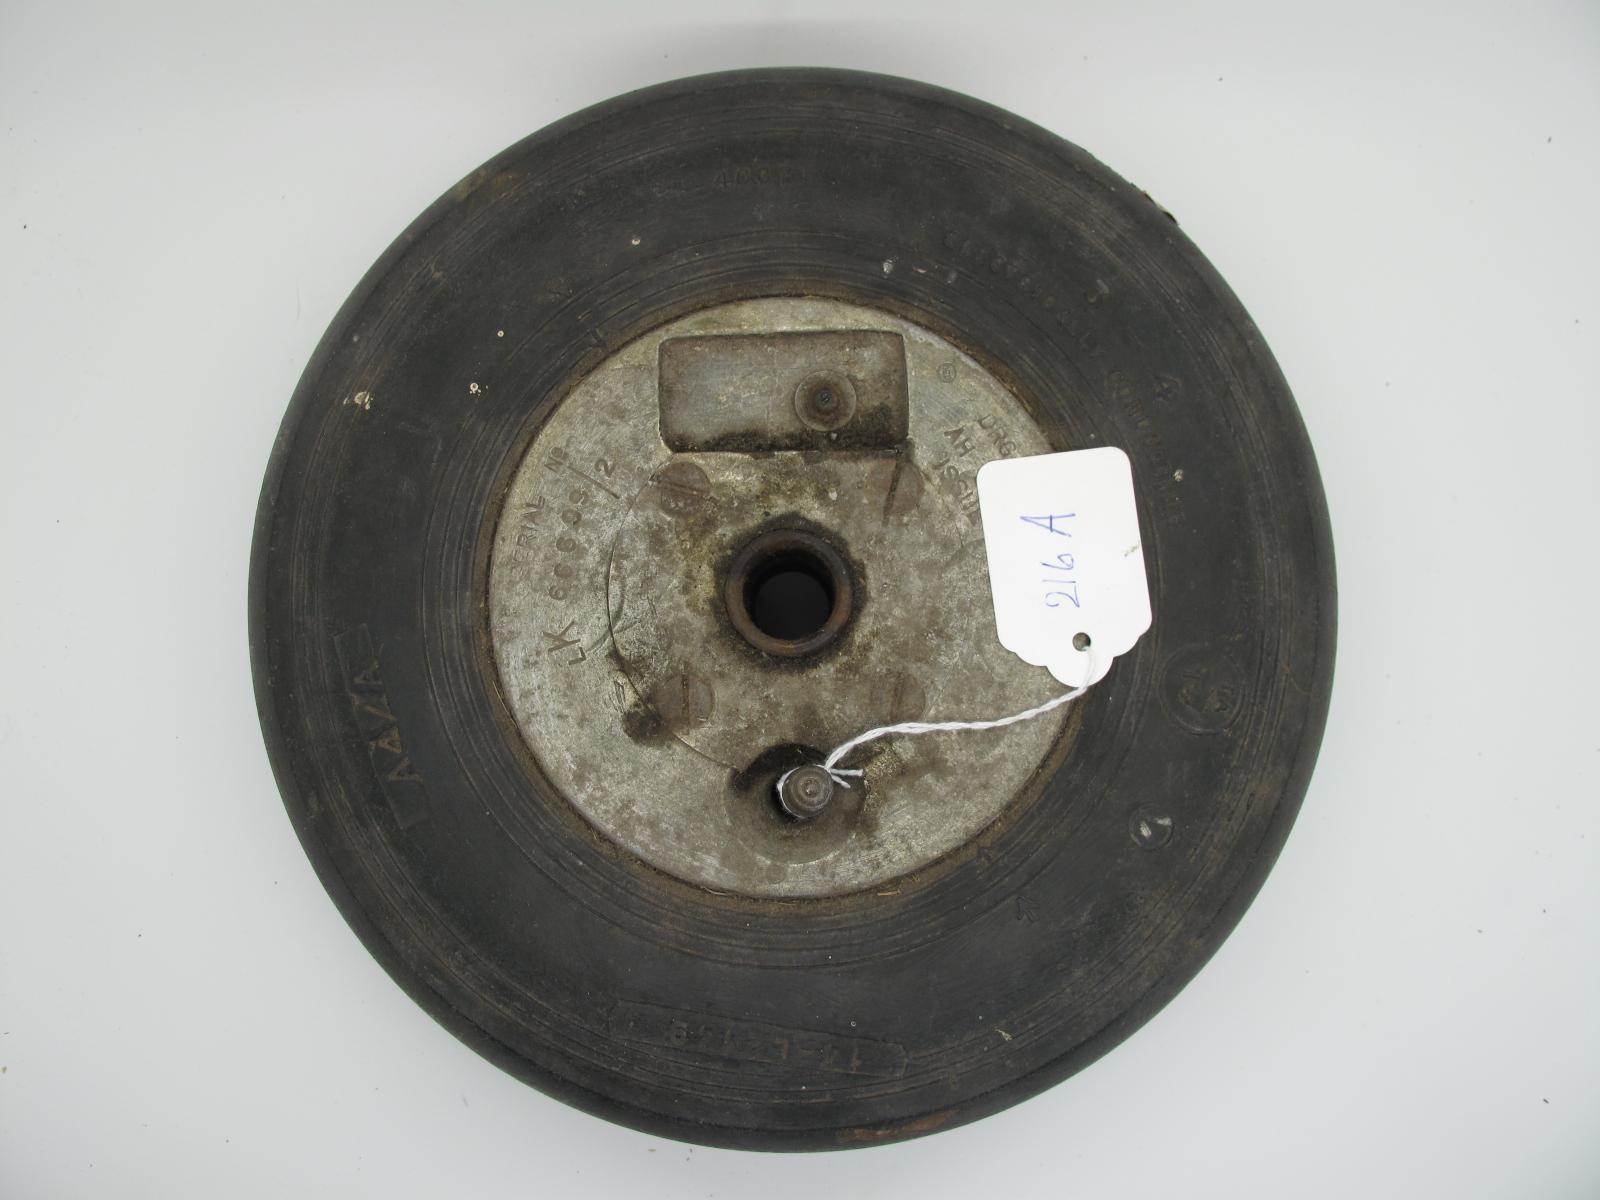 A Spitfire/Hurricane WWII Tail Wheel, Serial No 66699/2, AH 2184/2, 25cm diameter.